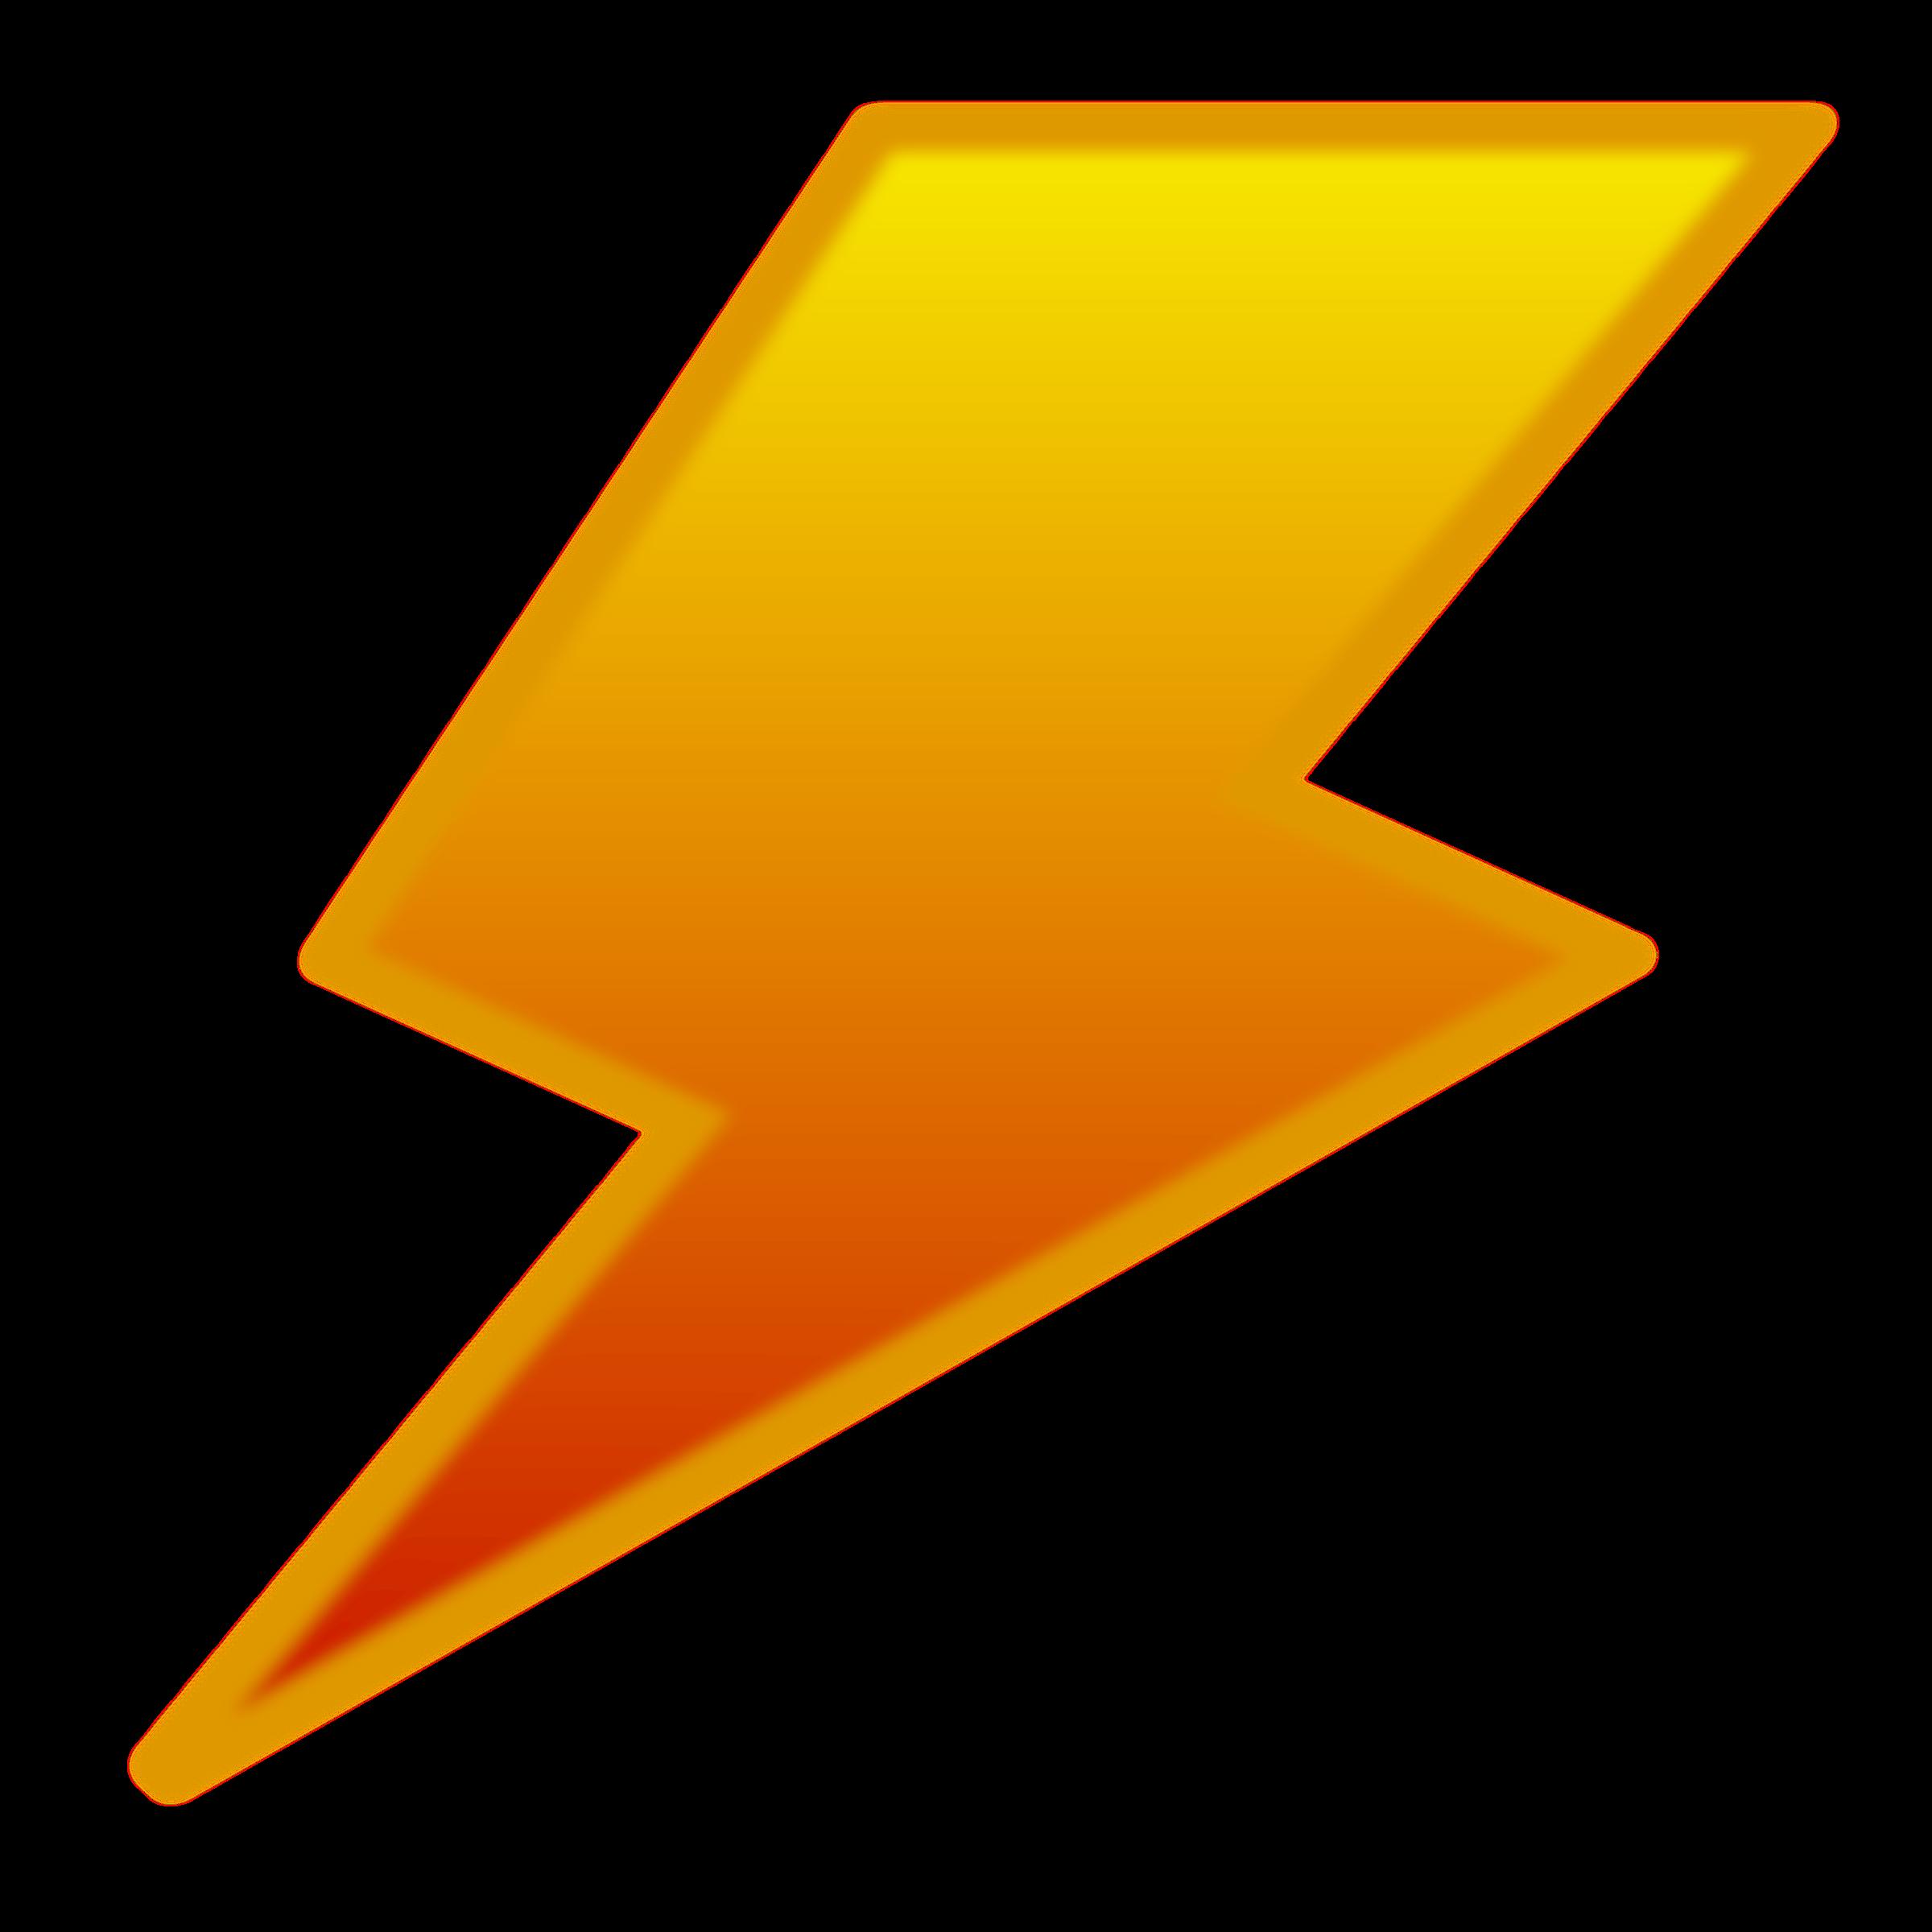 Clipart flash